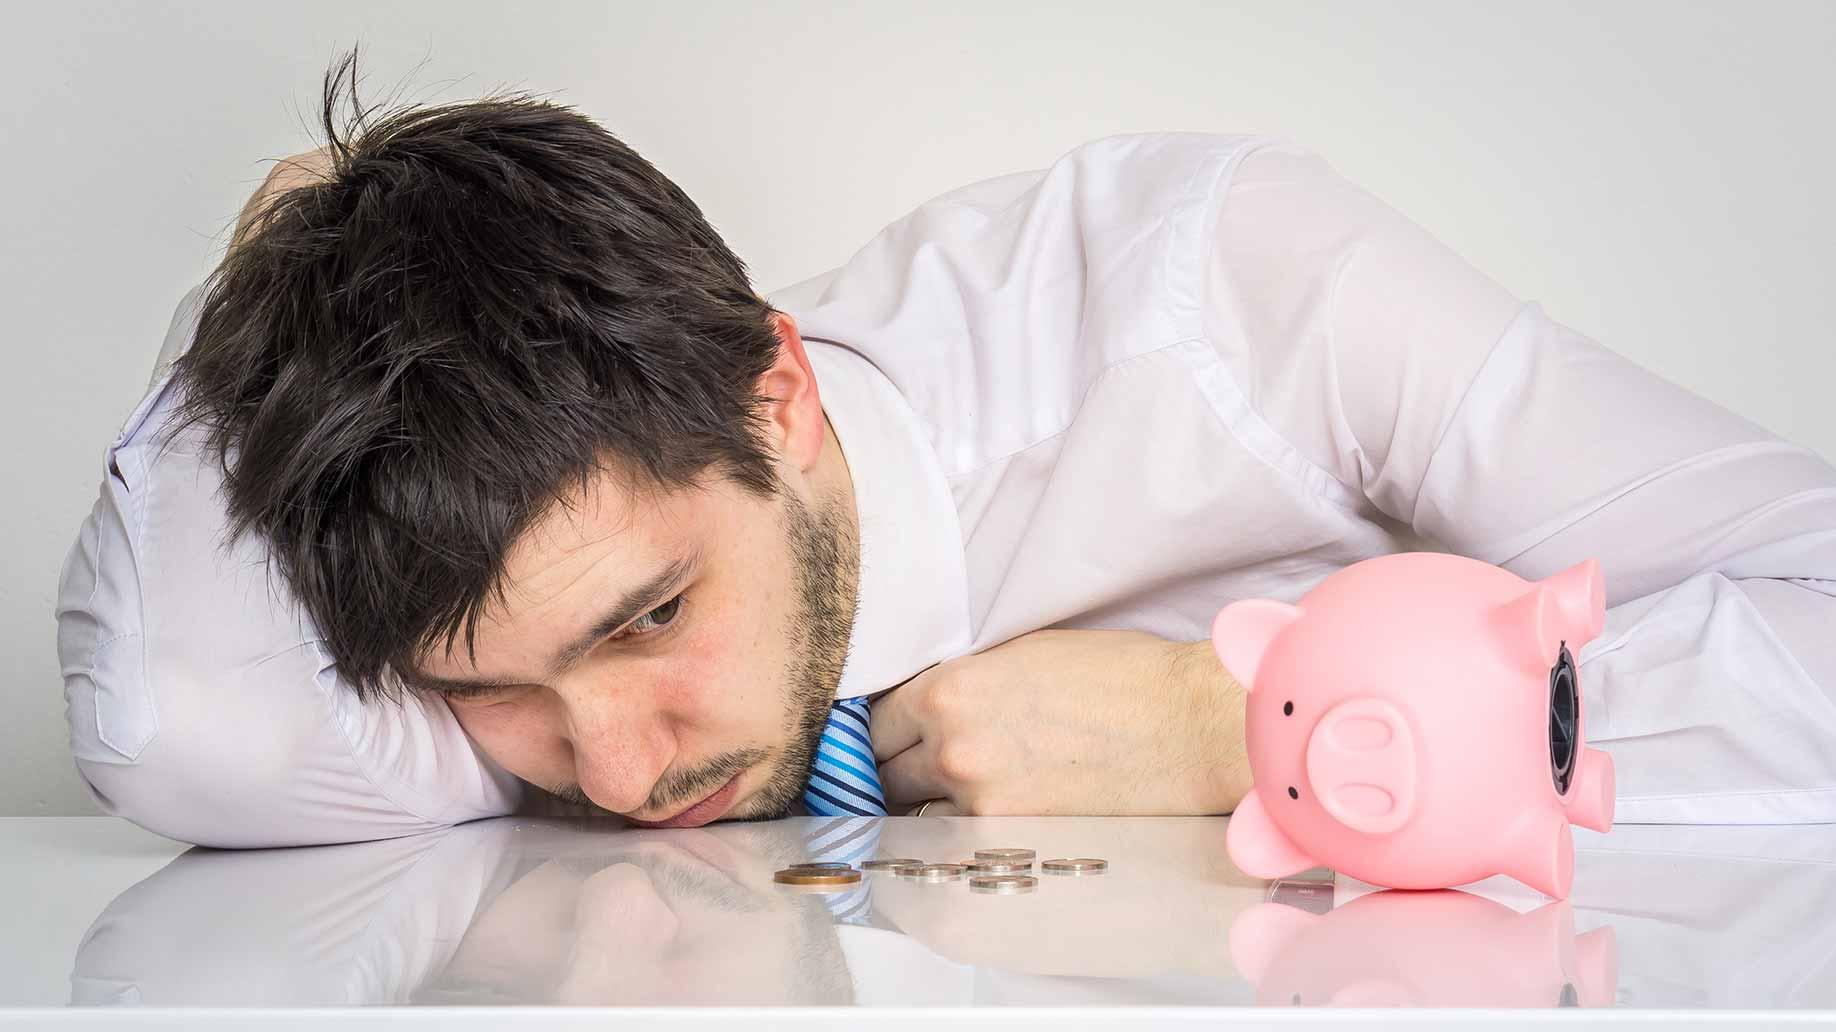 no money in piggy bank